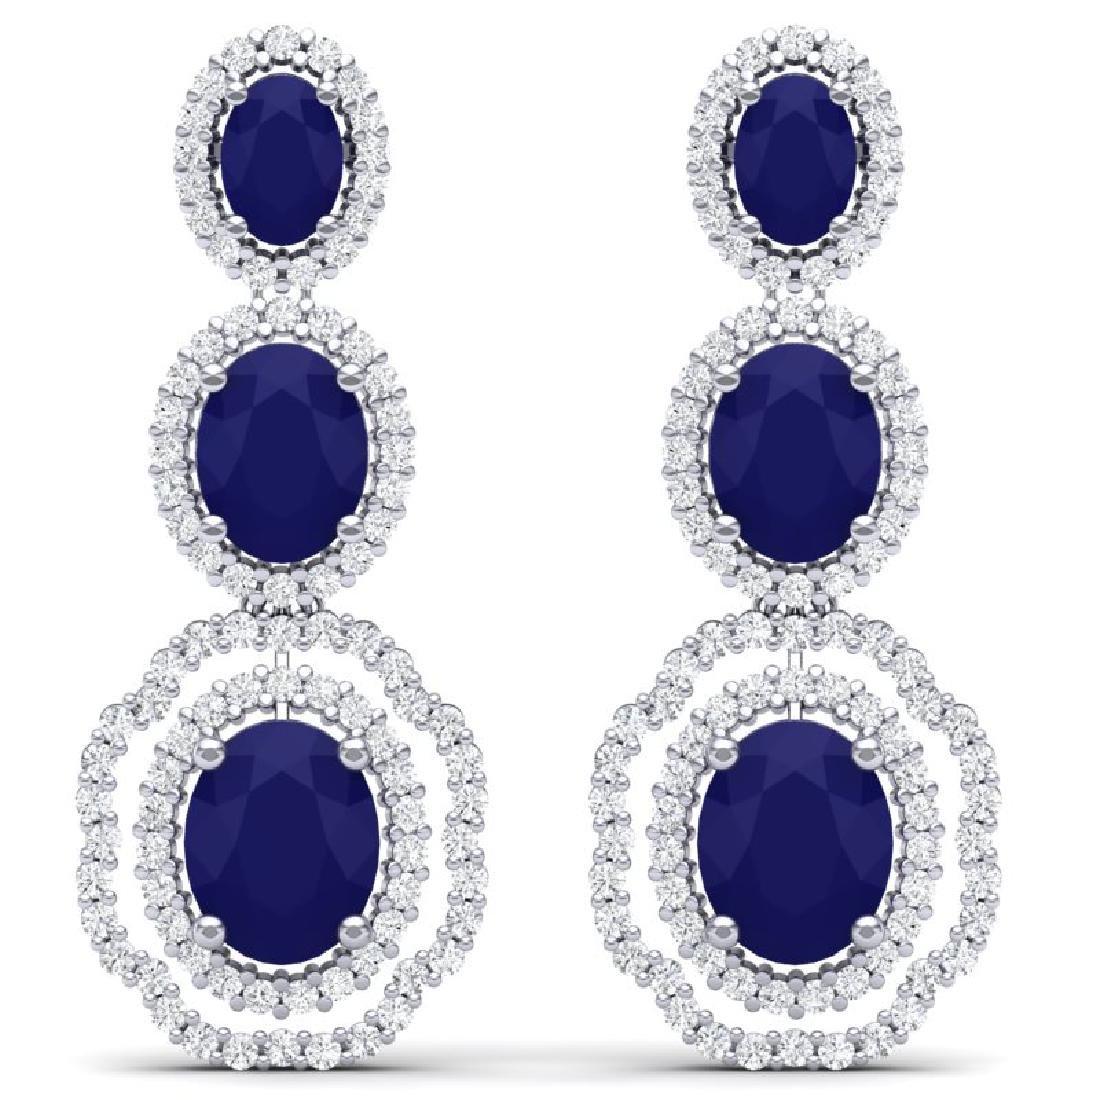 17.01 CTW Royalty Sapphire & VS Diamond Earrings 18K